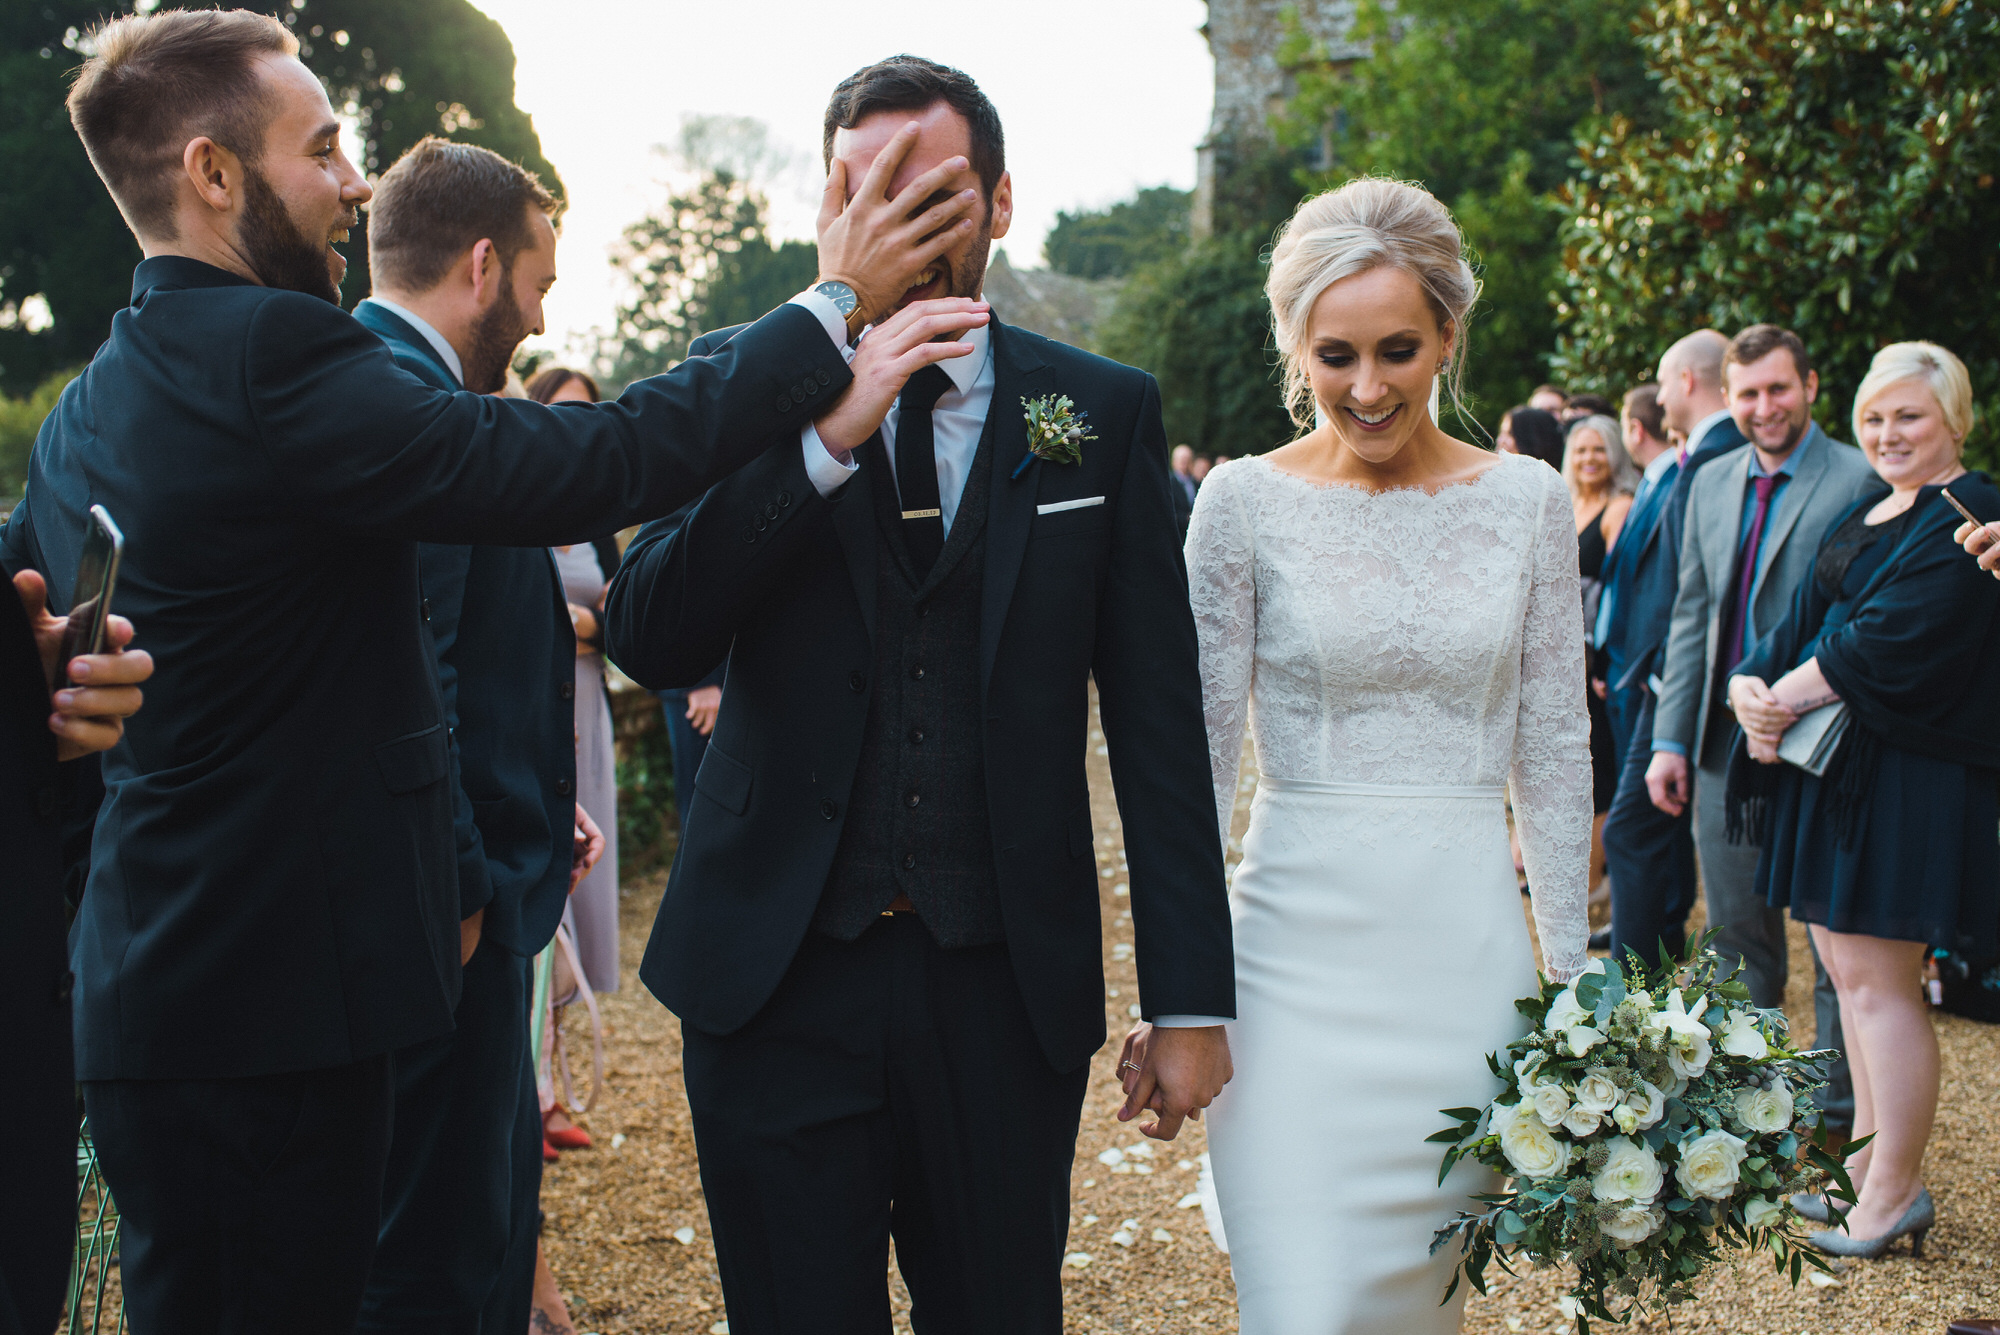 Brympton House wedding confetti by simon biffen photography 25